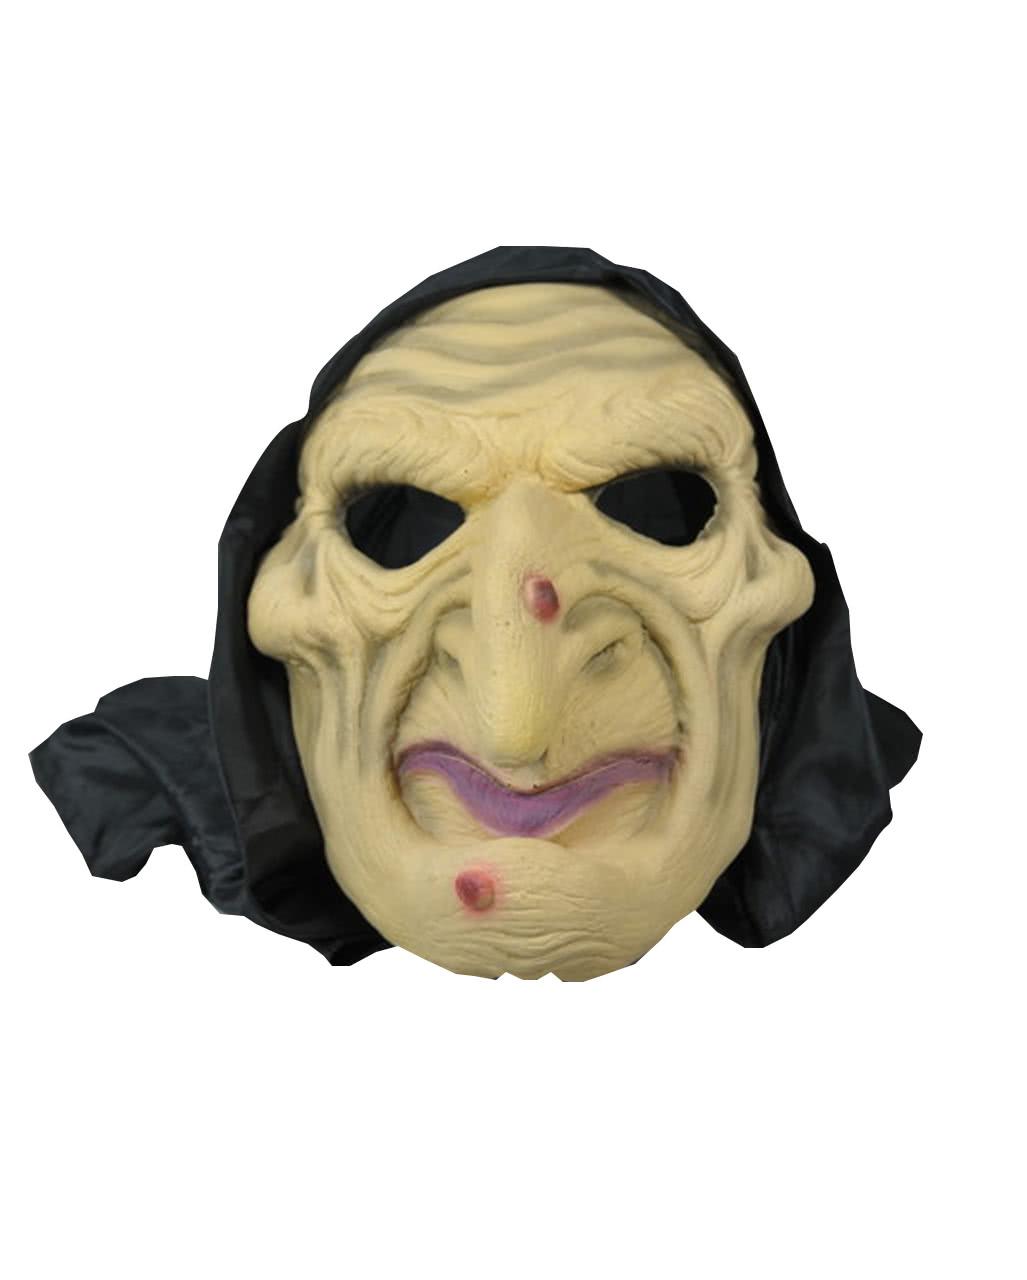 hexen maske mit kapuze halloween masken kaufen horror. Black Bedroom Furniture Sets. Home Design Ideas